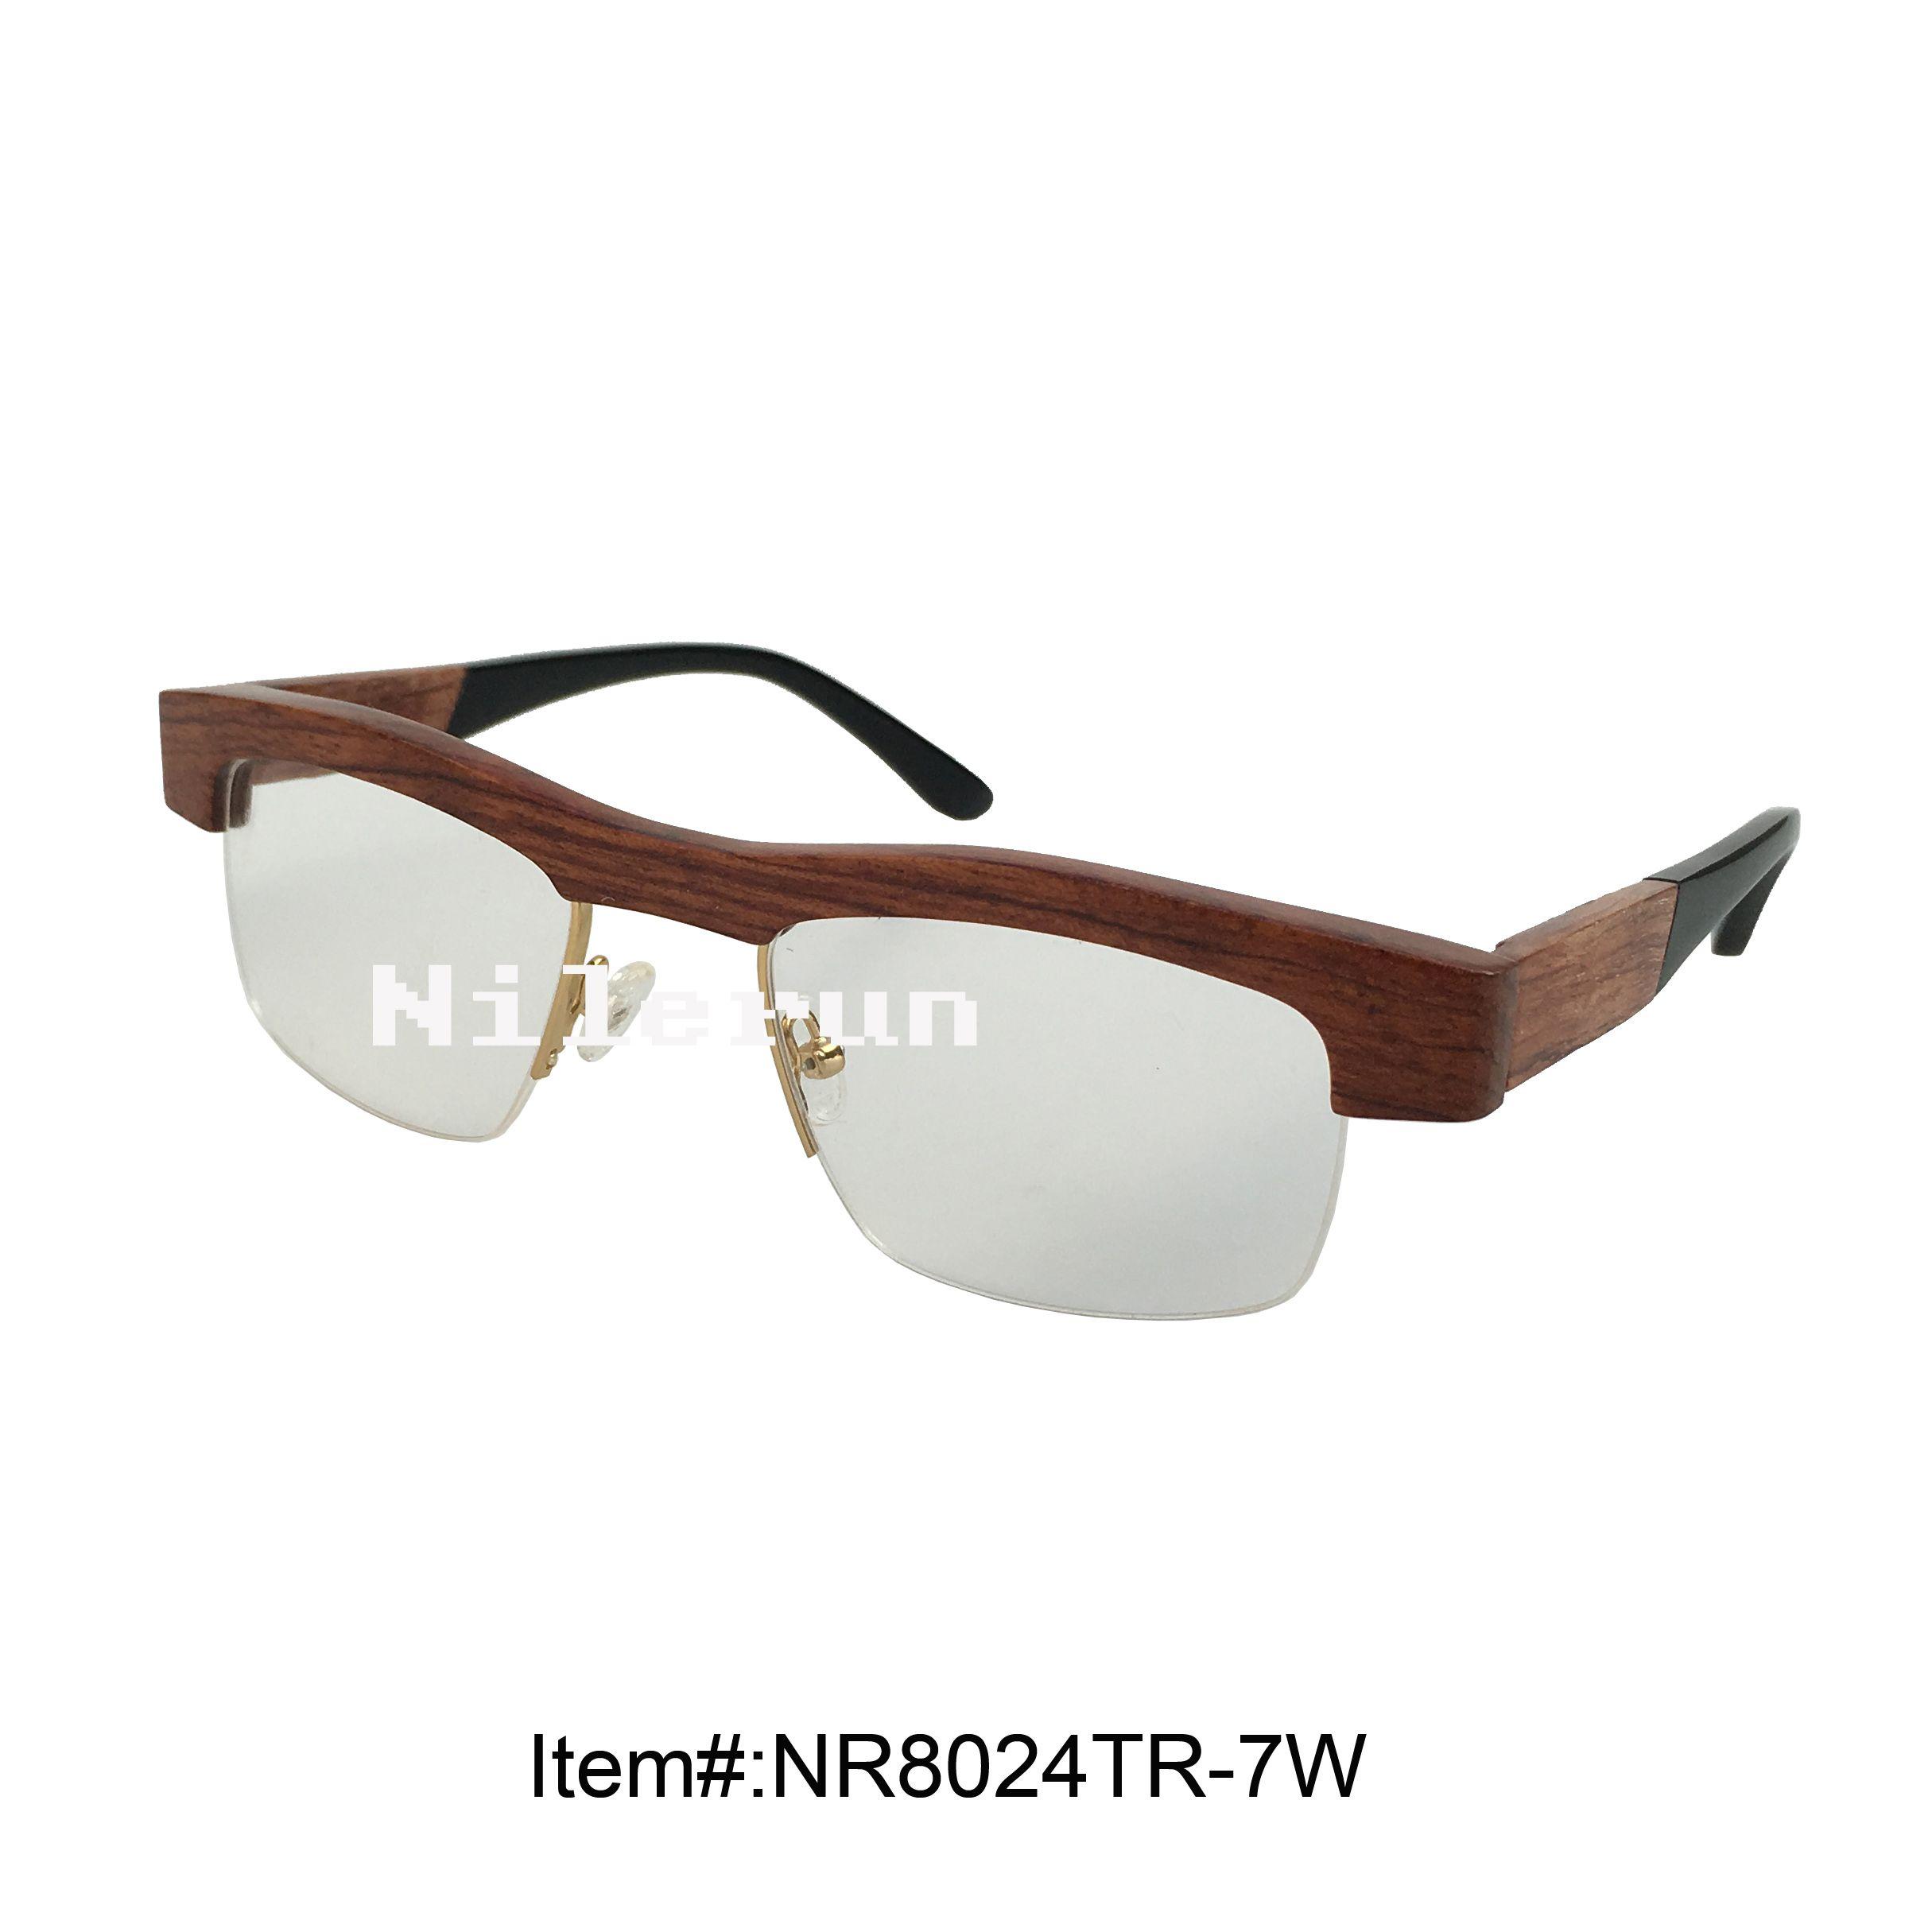 486eae2539 Red Sandalwood Half Frame Optical Eyeglasses with Acetate Temples Wood  Optical Frame Red Sandalwood Optical Glasses Red Sandalwood Optical  Eyeglasses Online ...